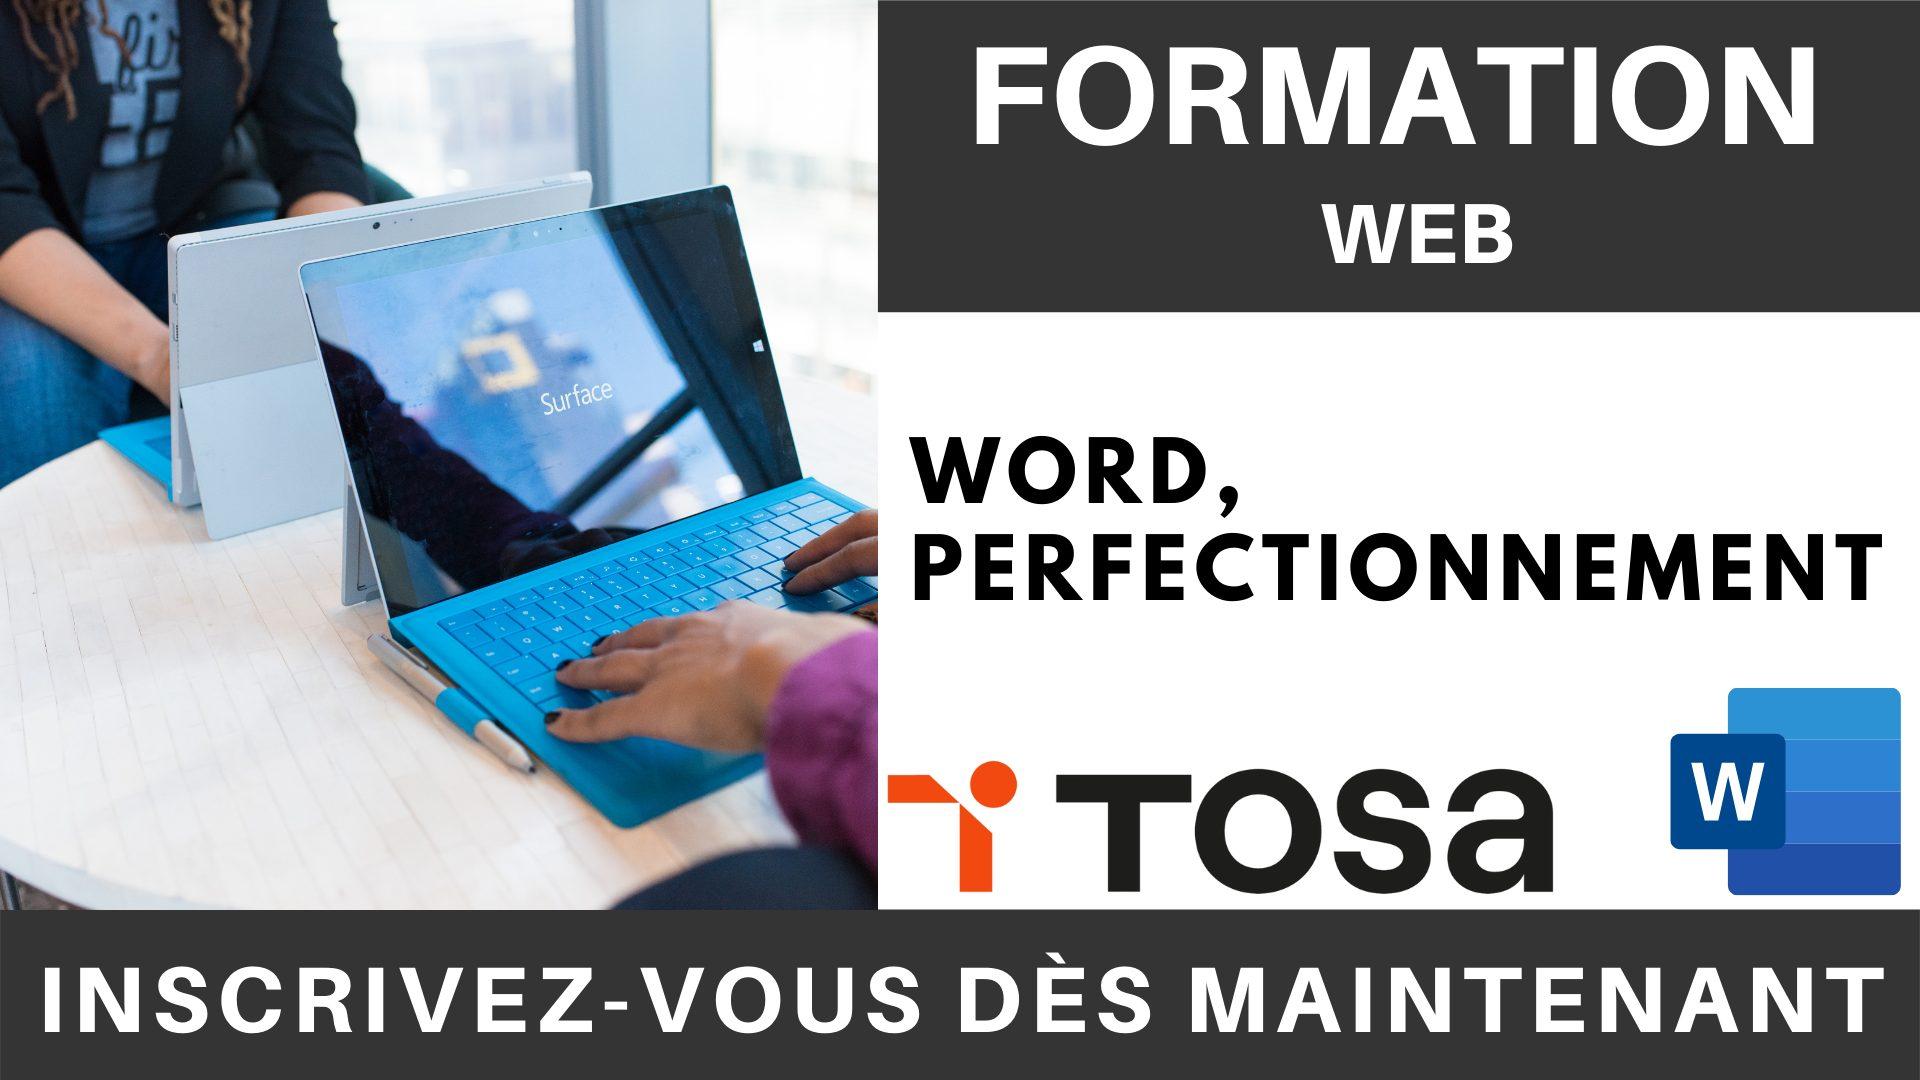 Formation LOGICIEL - Word, Perfectionnement (2)